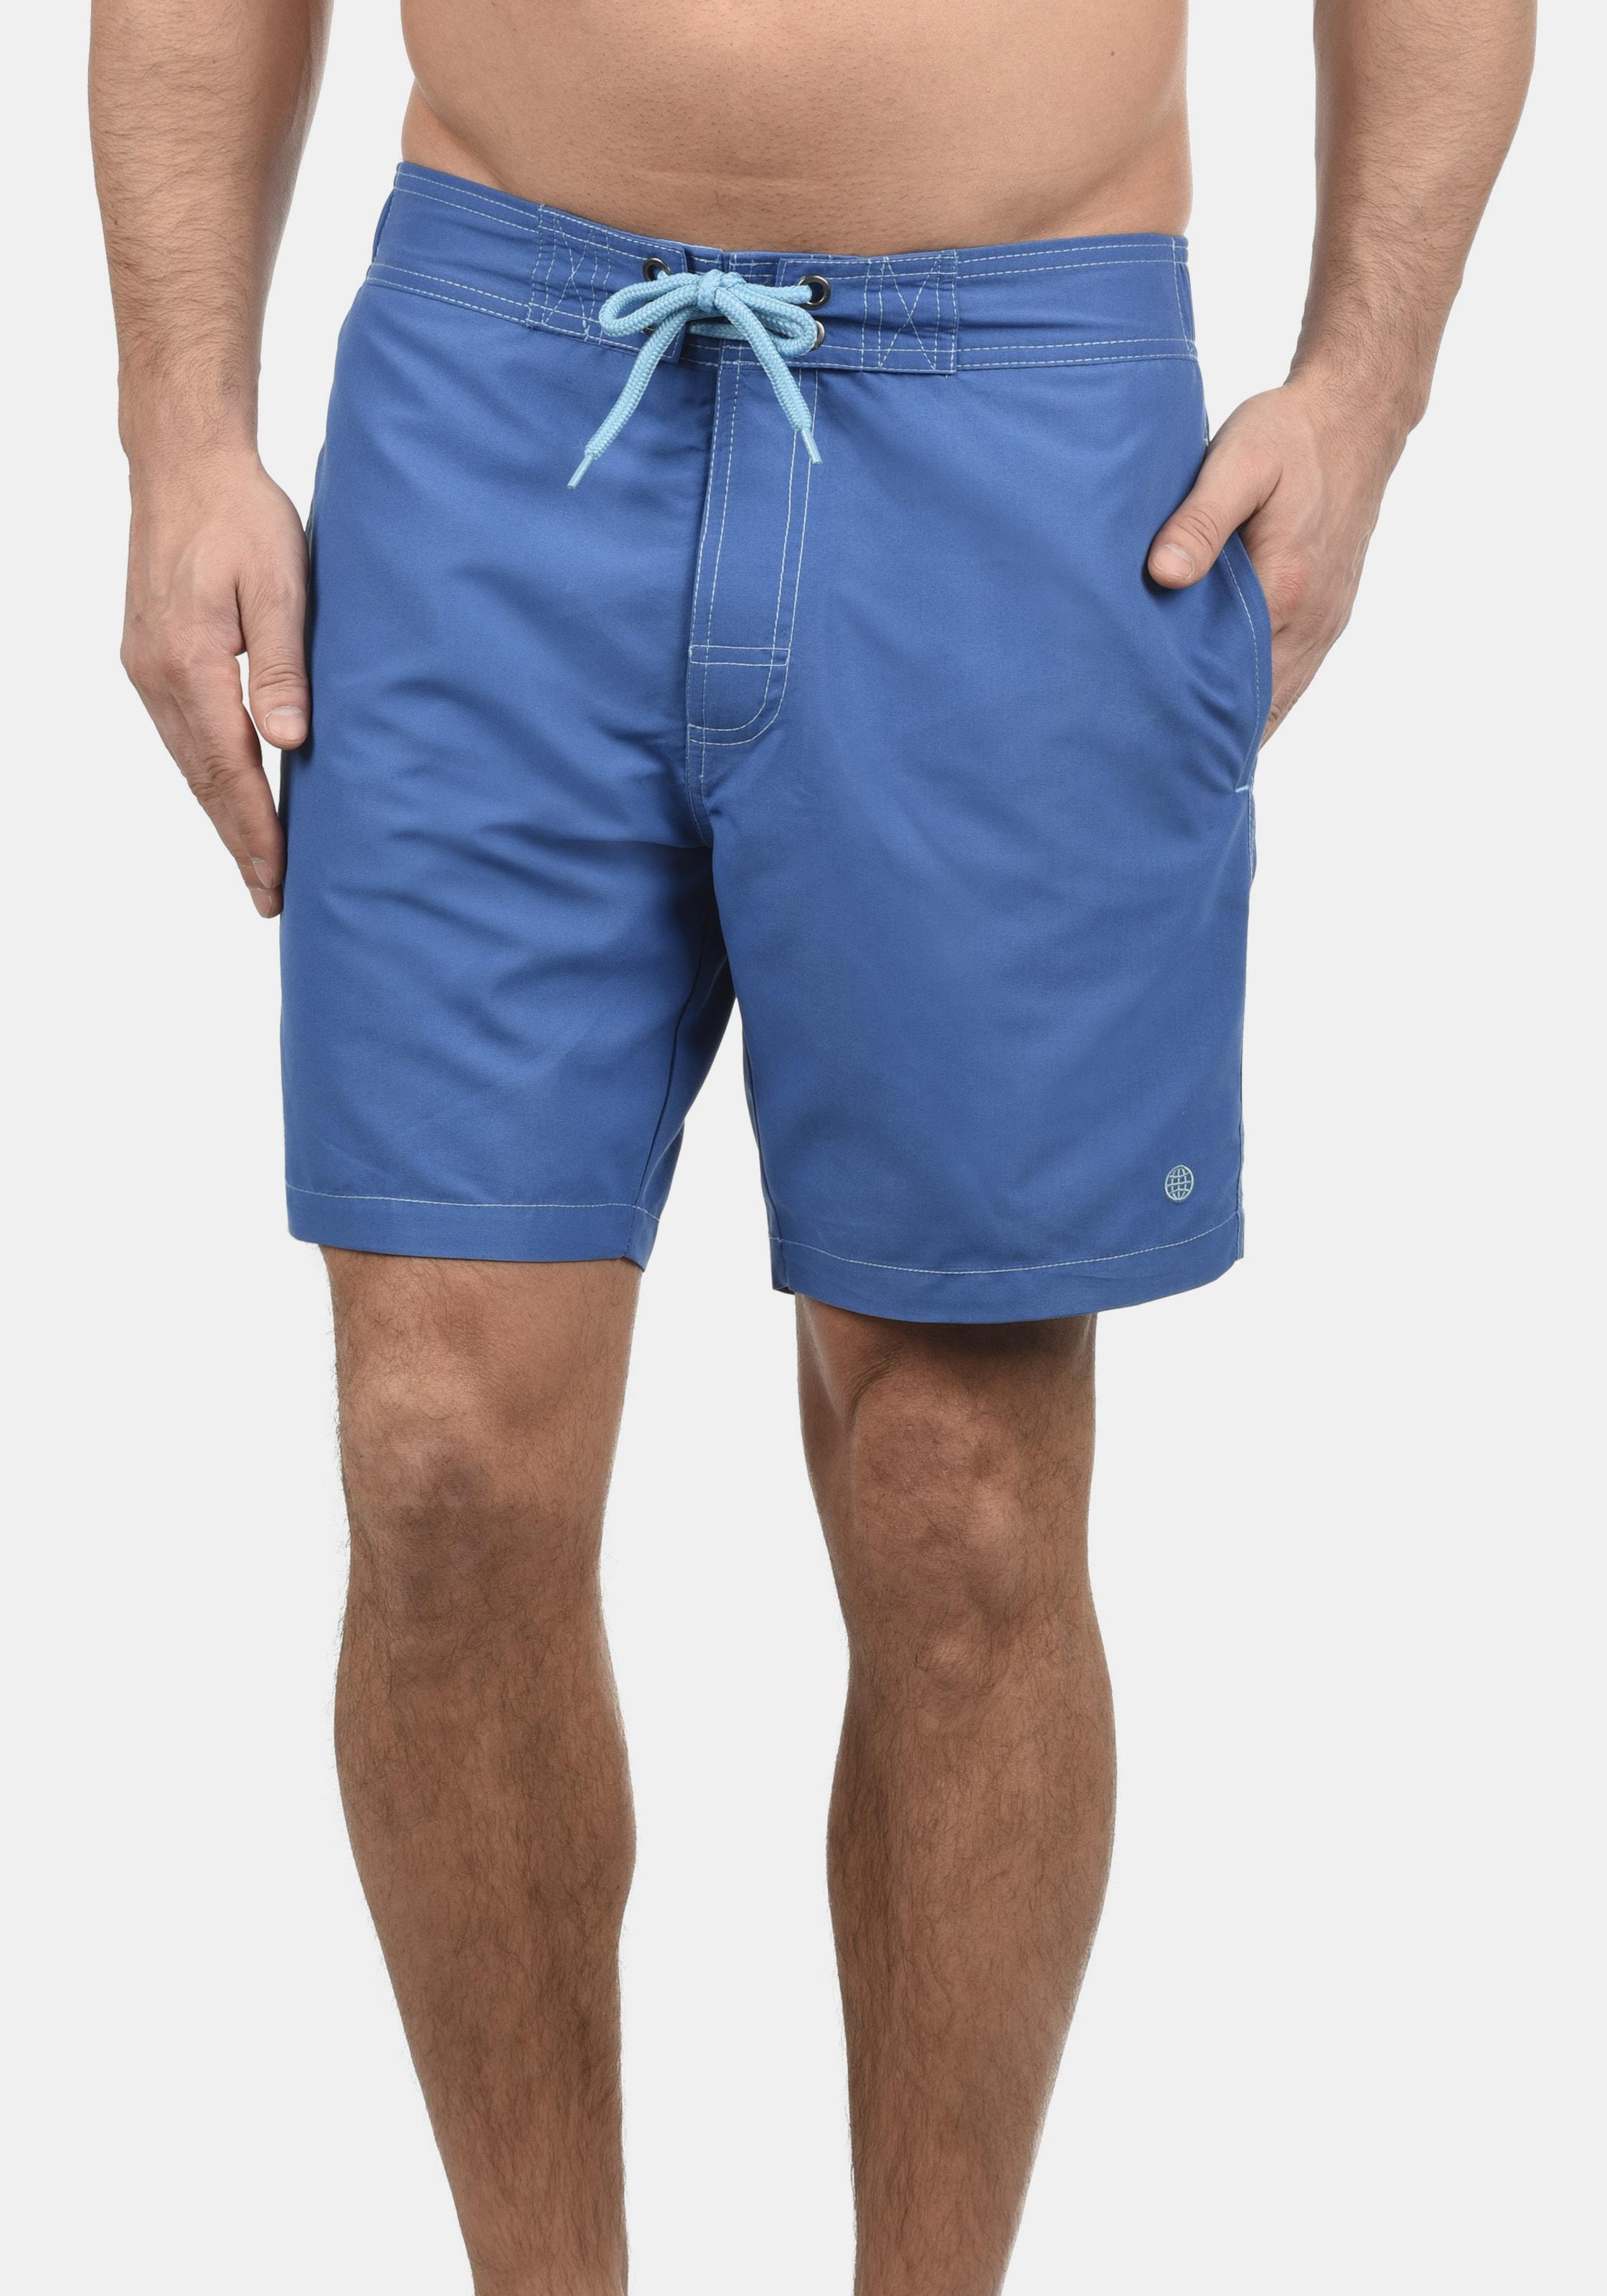 Shorts 'gomes' Blend In Blau Blend Shorts lK1JFc3T